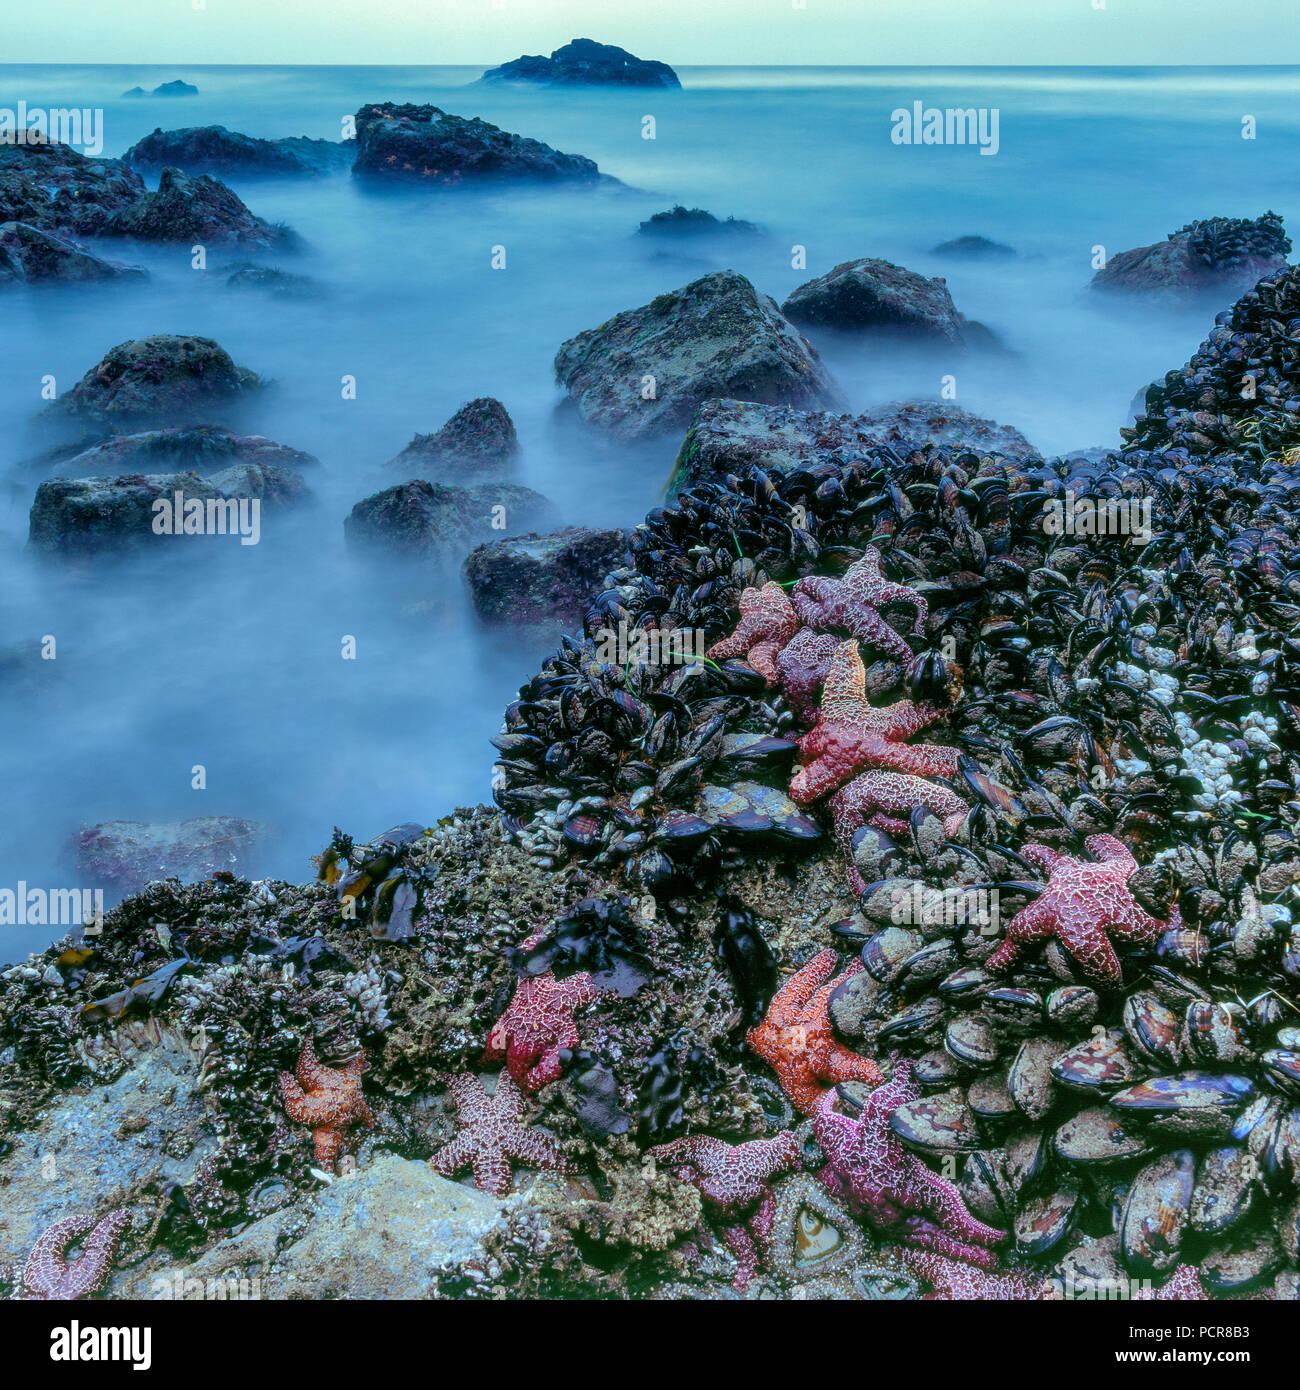 Tidepool, Seastars, Asteroidea, Burton Wilderness, Point Reyes National Seashore, Marin County, California - Stock Image